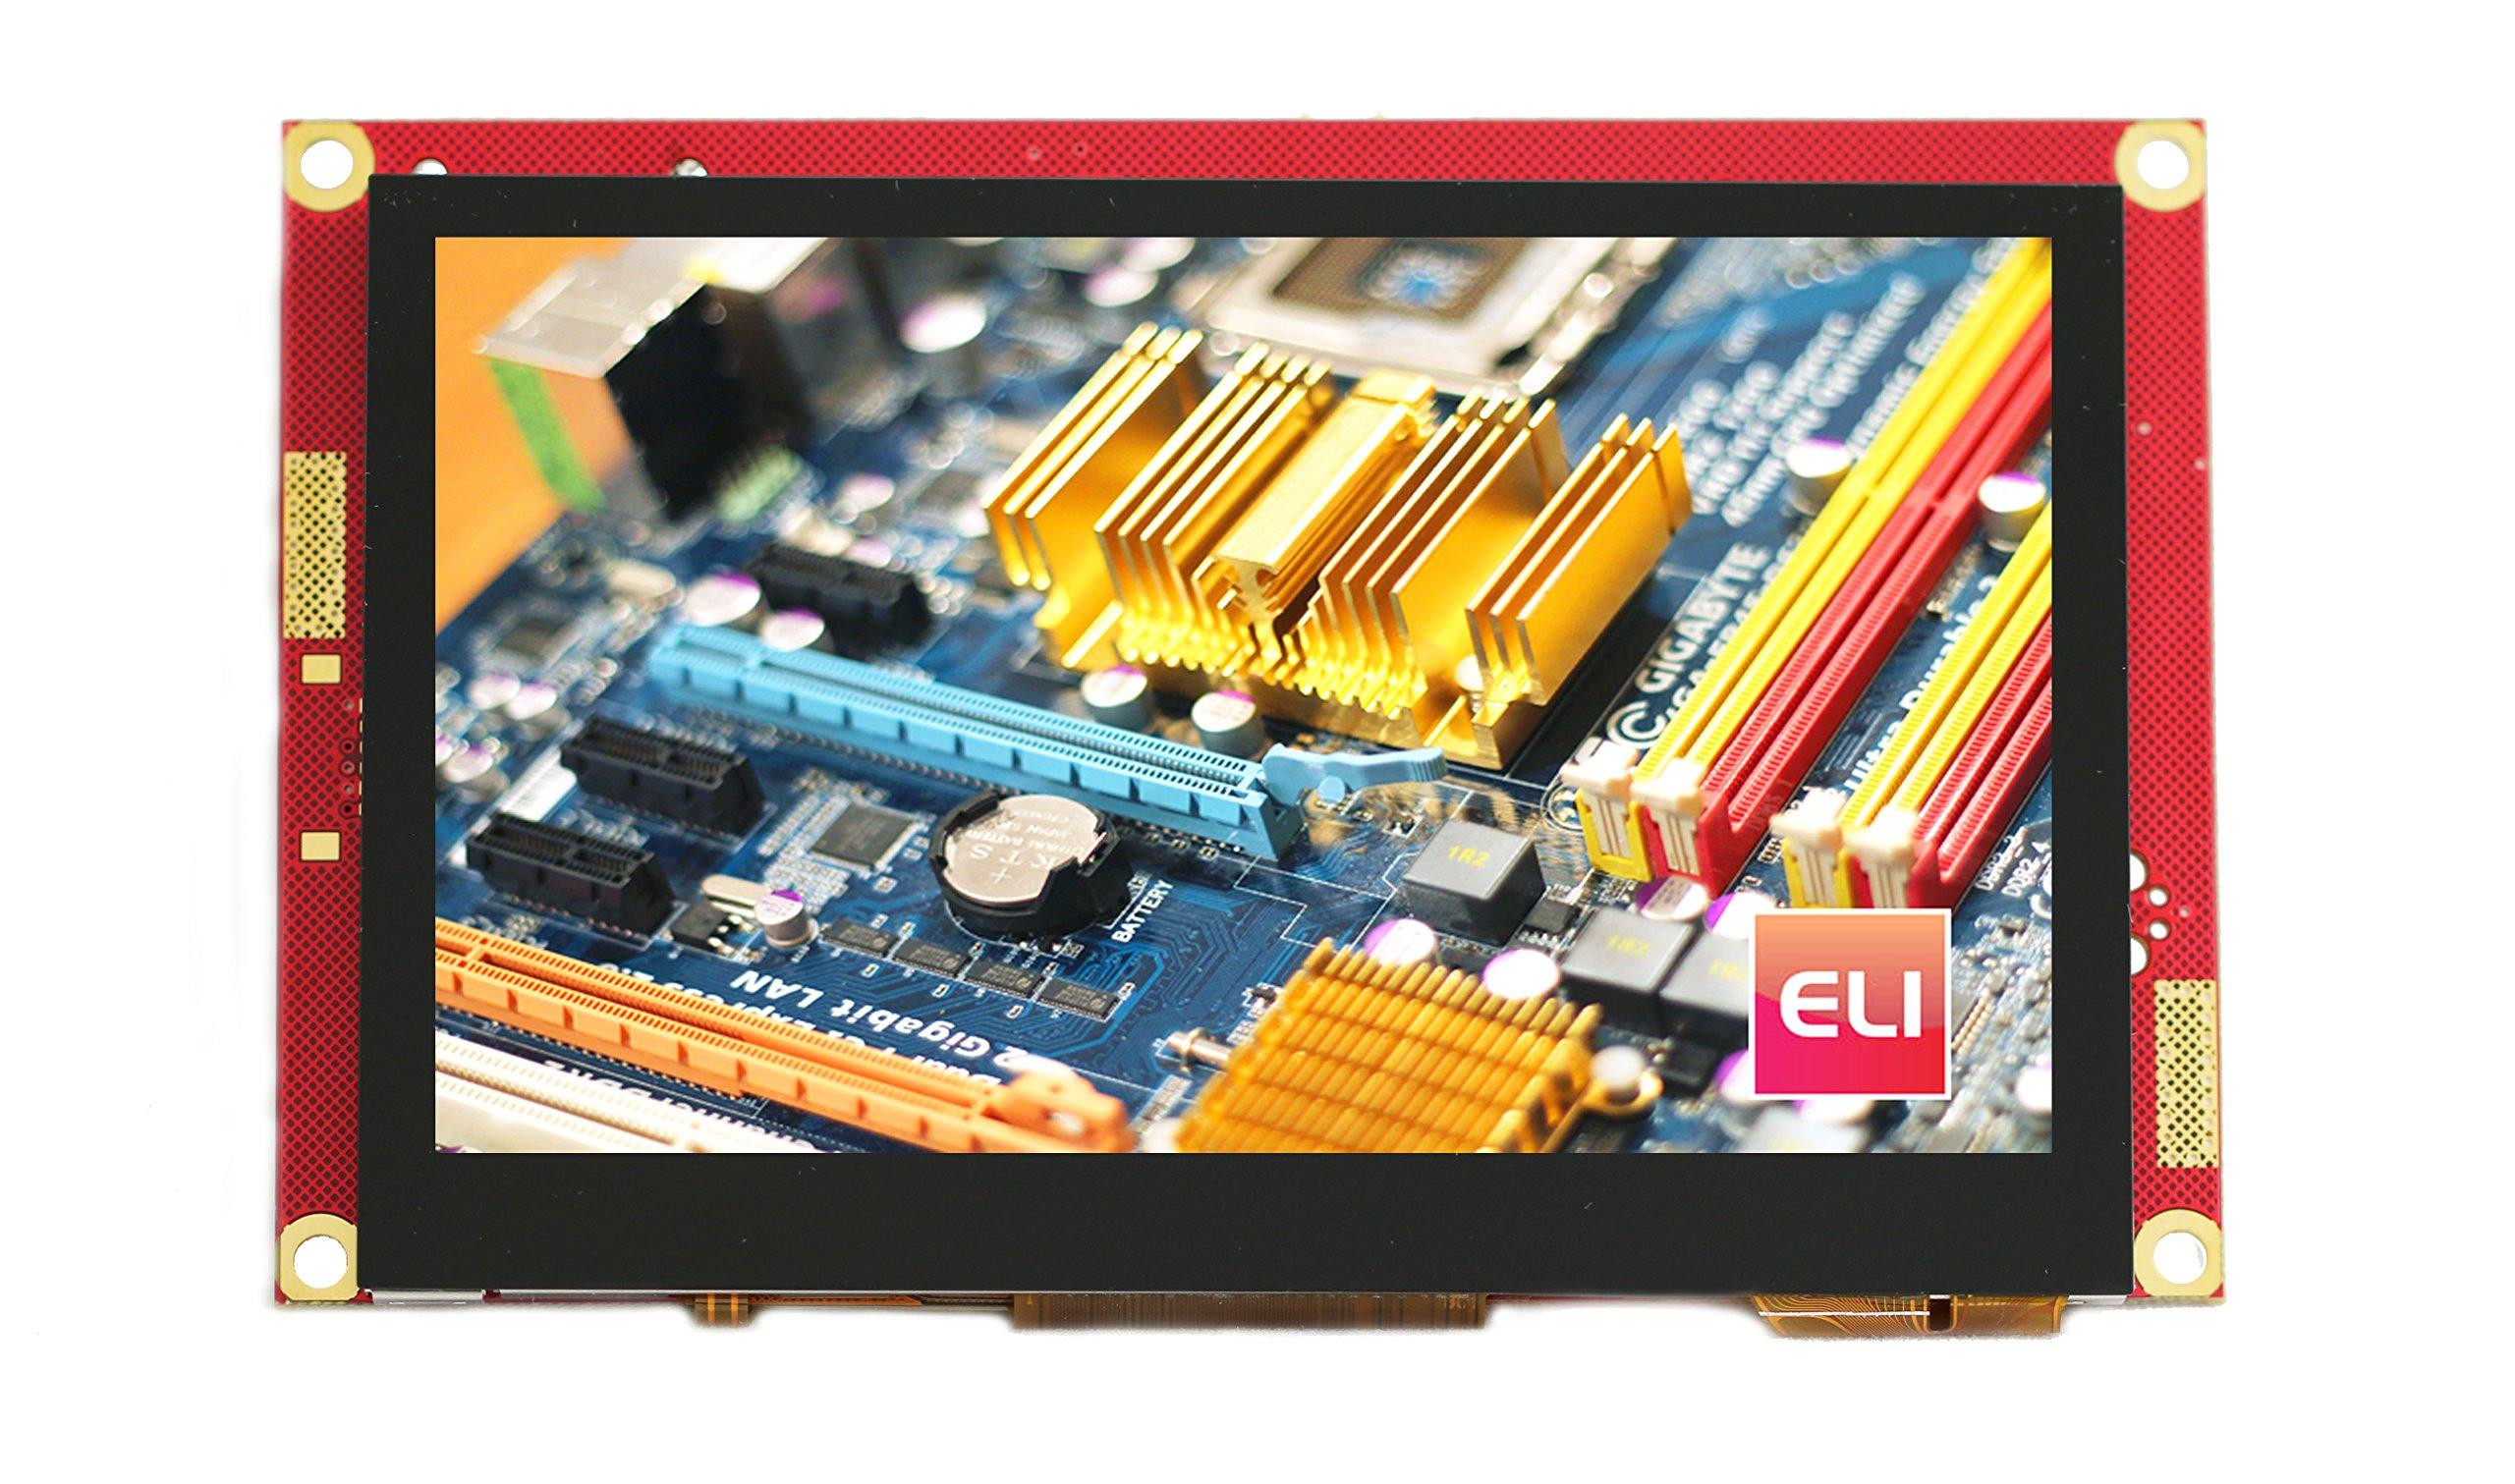 ELI 4.3'' HDMI PCAP Touch screen 480x272 WQVGA LCD - Plug and Play